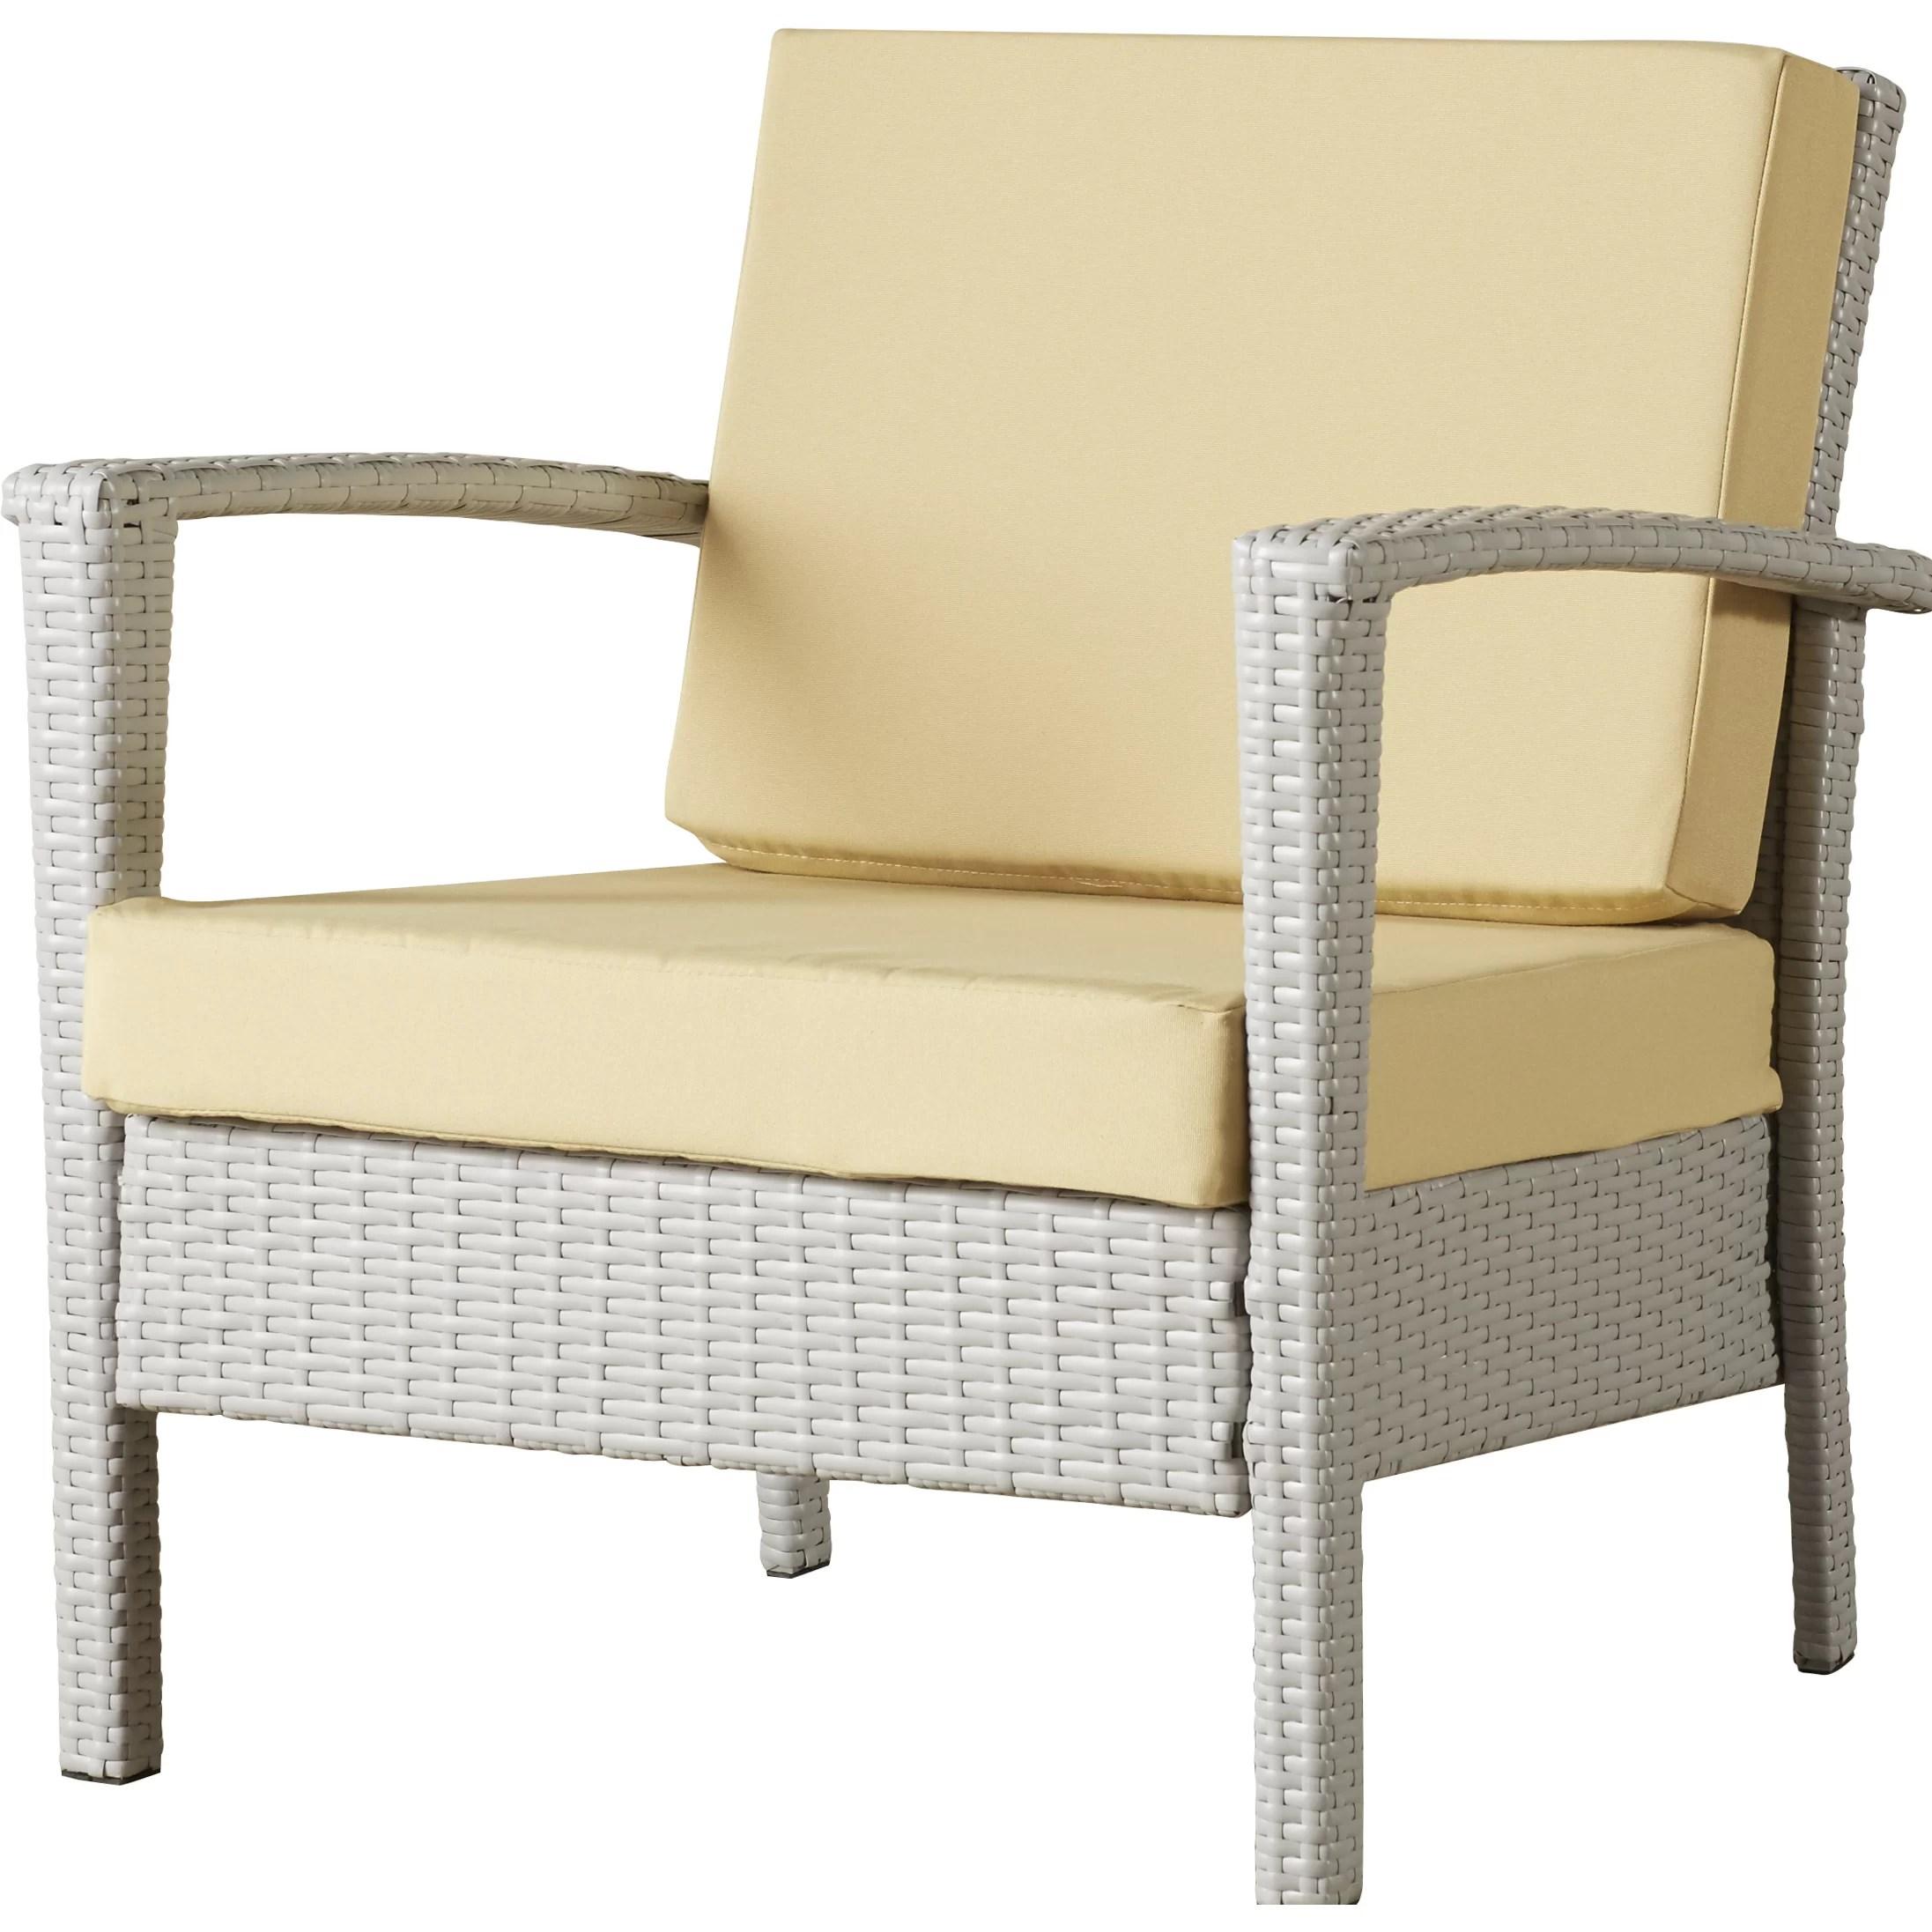 1 piece patio chair cushions peg perego high zero3 brayden studio piscataway 4 outdoor dining